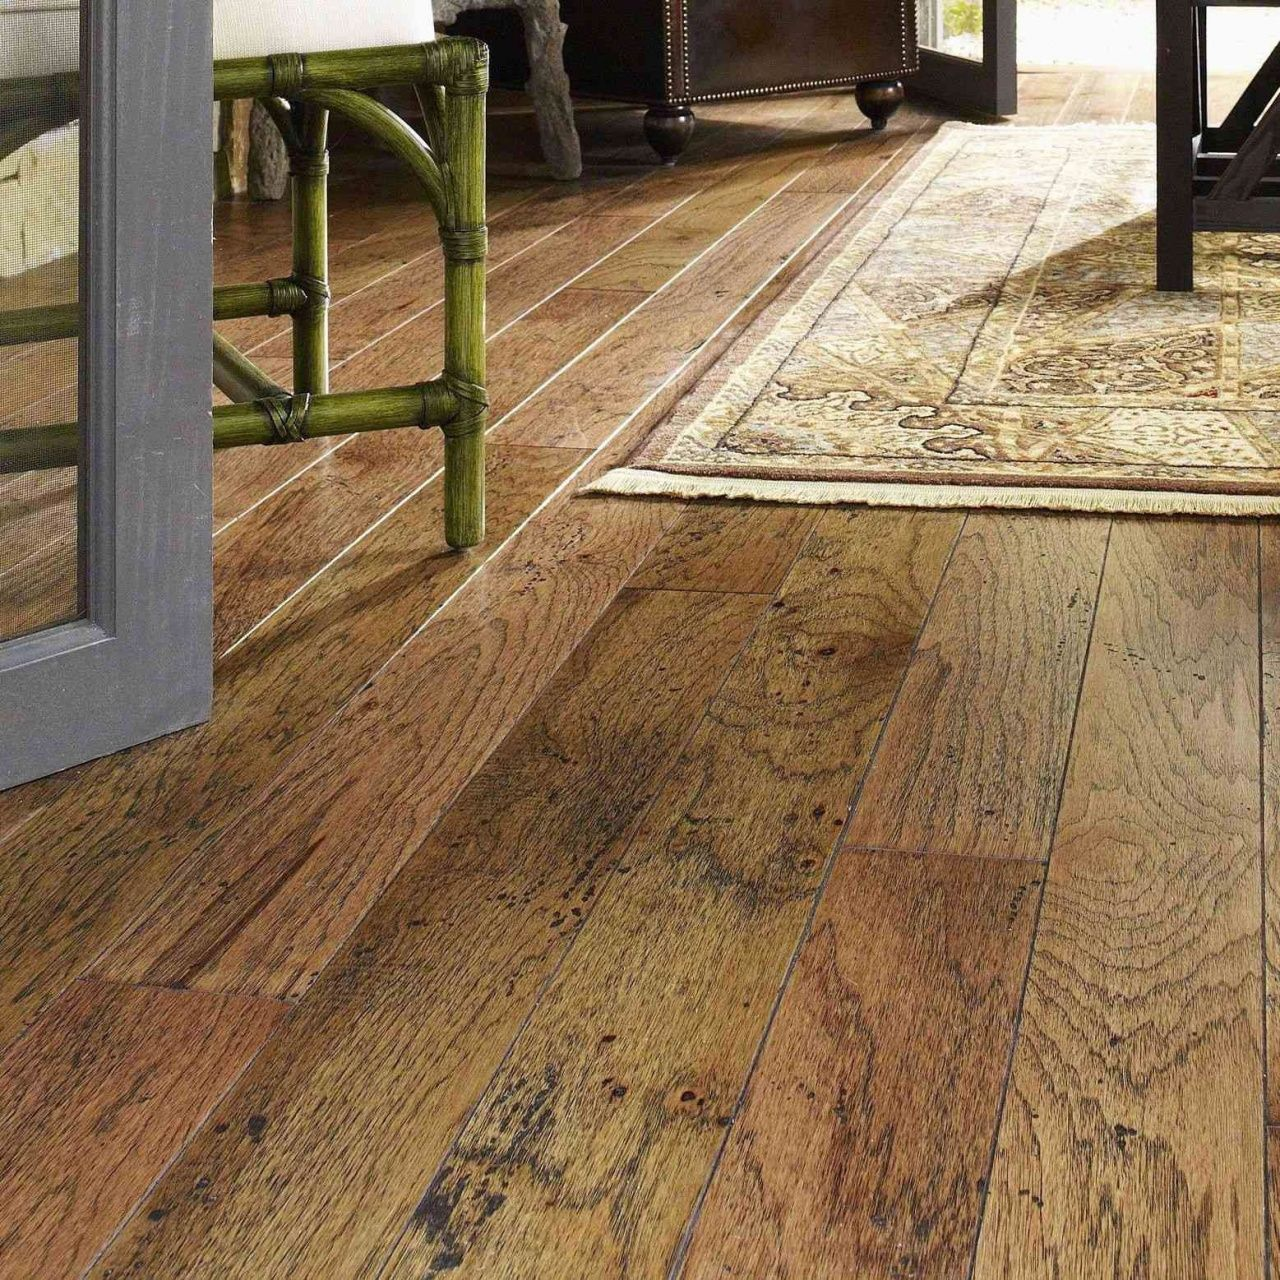 How Much Does It Cost To Install Backsplash In 2020 Wood Laminate Flooring Engineered Wood Floors Porcelain Flooring